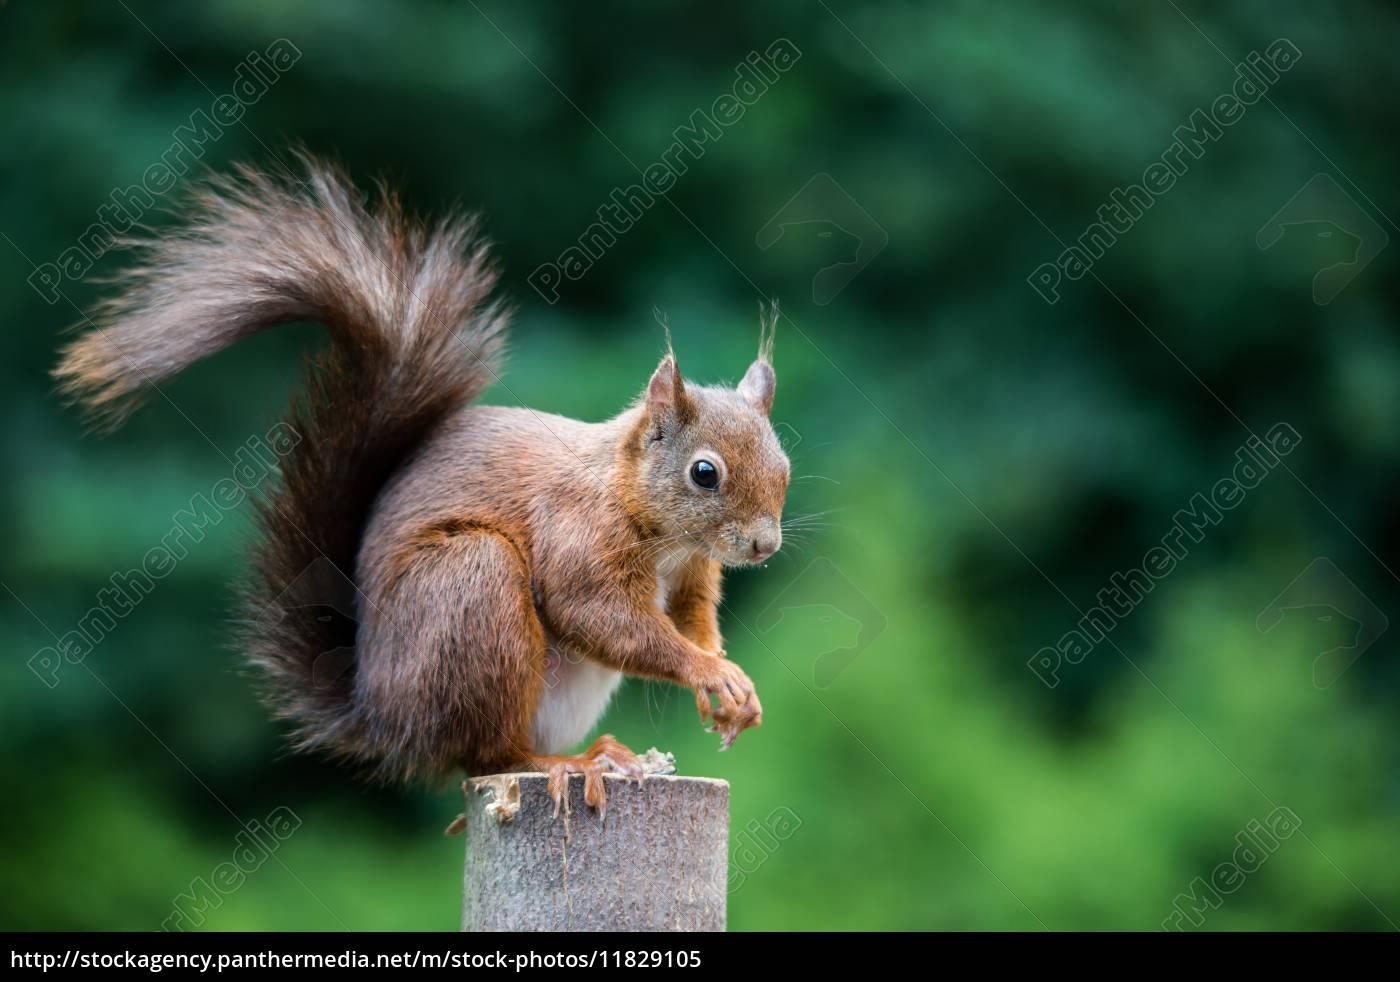 eichhörnchen, sciurus, vulgaris, bild, 6 - 11829105